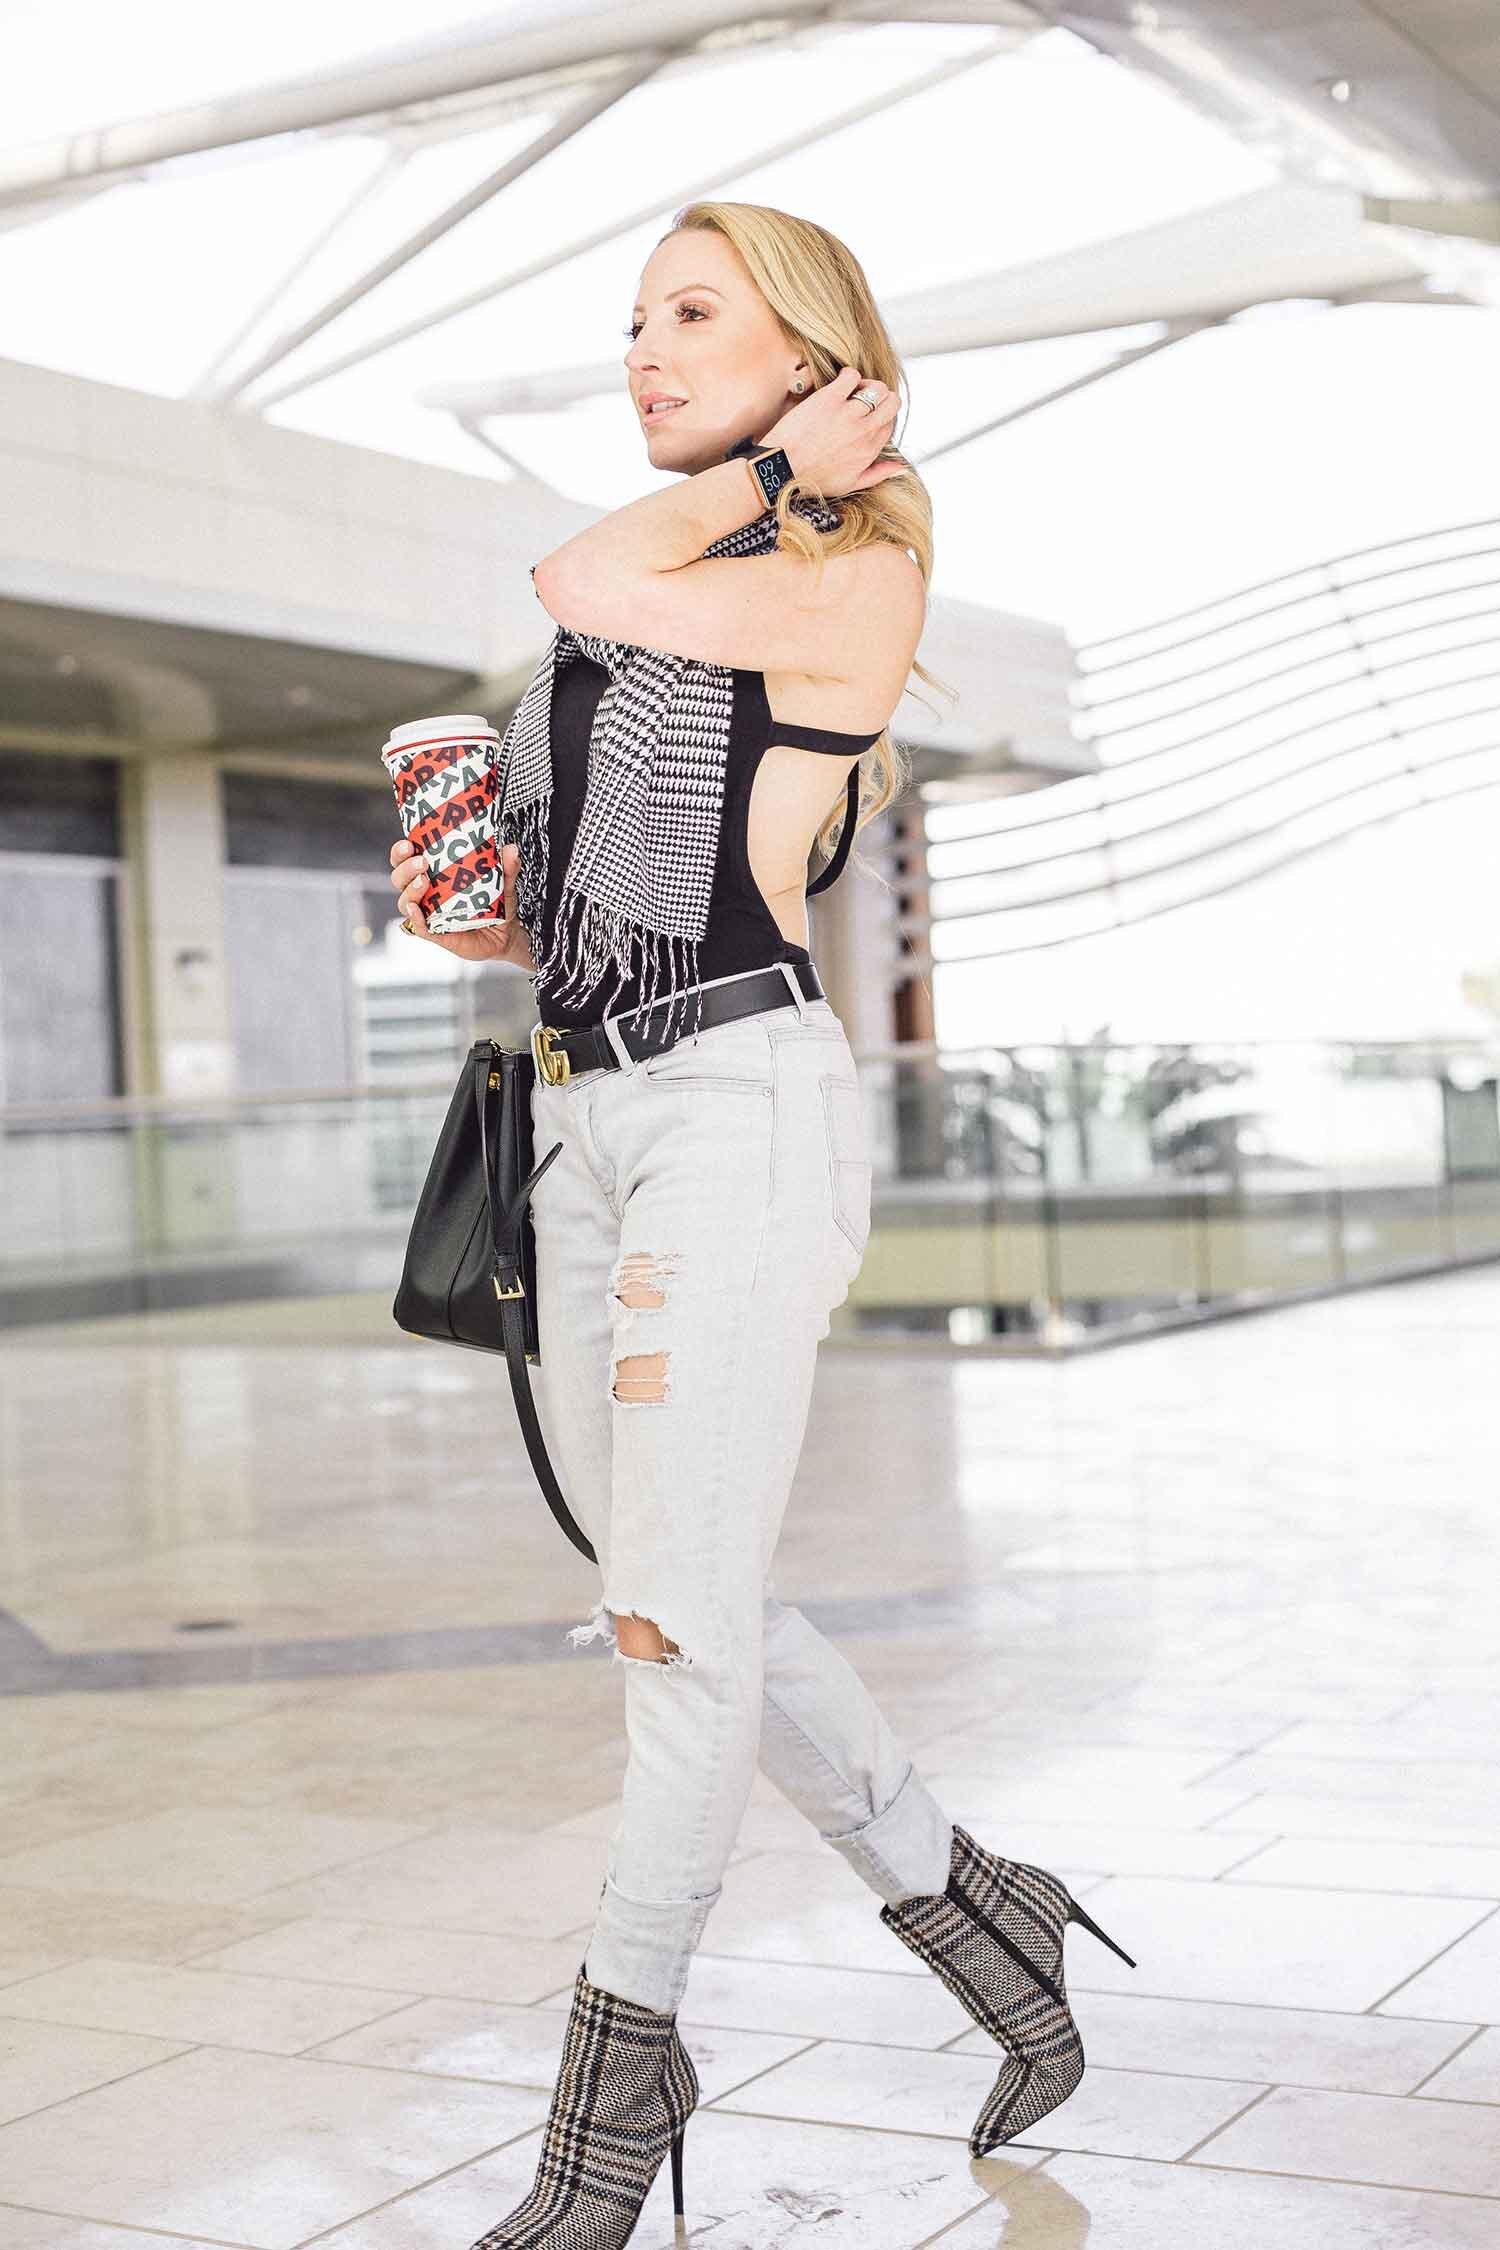 low sugar Starbucks drinks Fitness blogger Eve Dawes walking